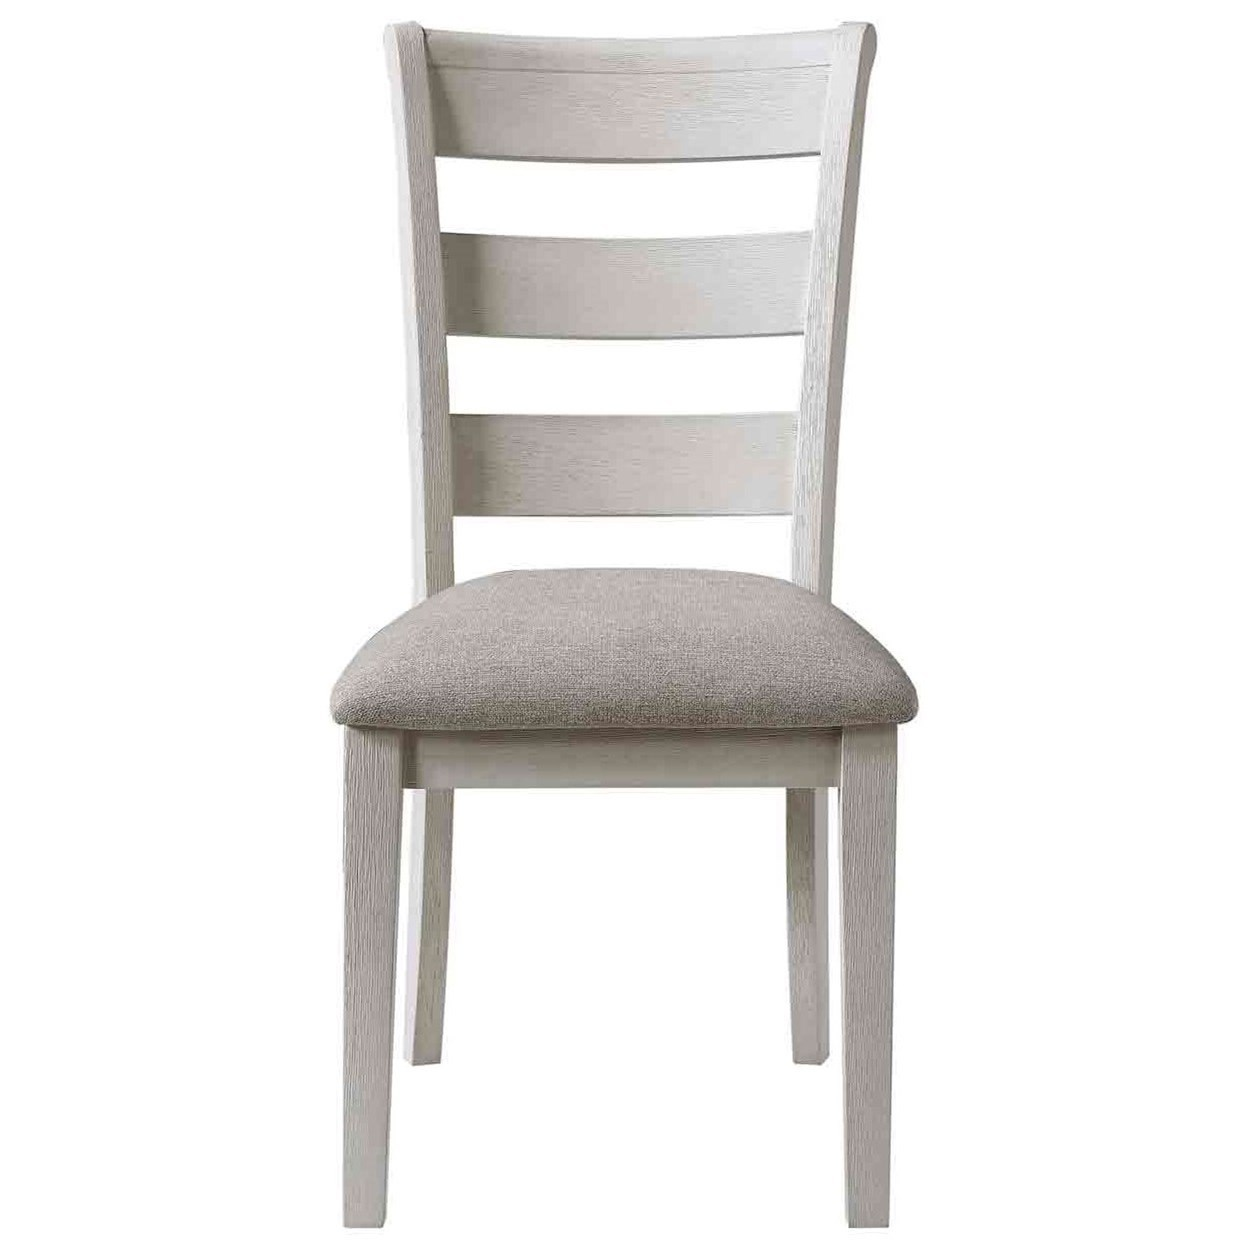 Pendleton Upholstered Ladderback Side Chair by Steve Silver at Walker's Furniture